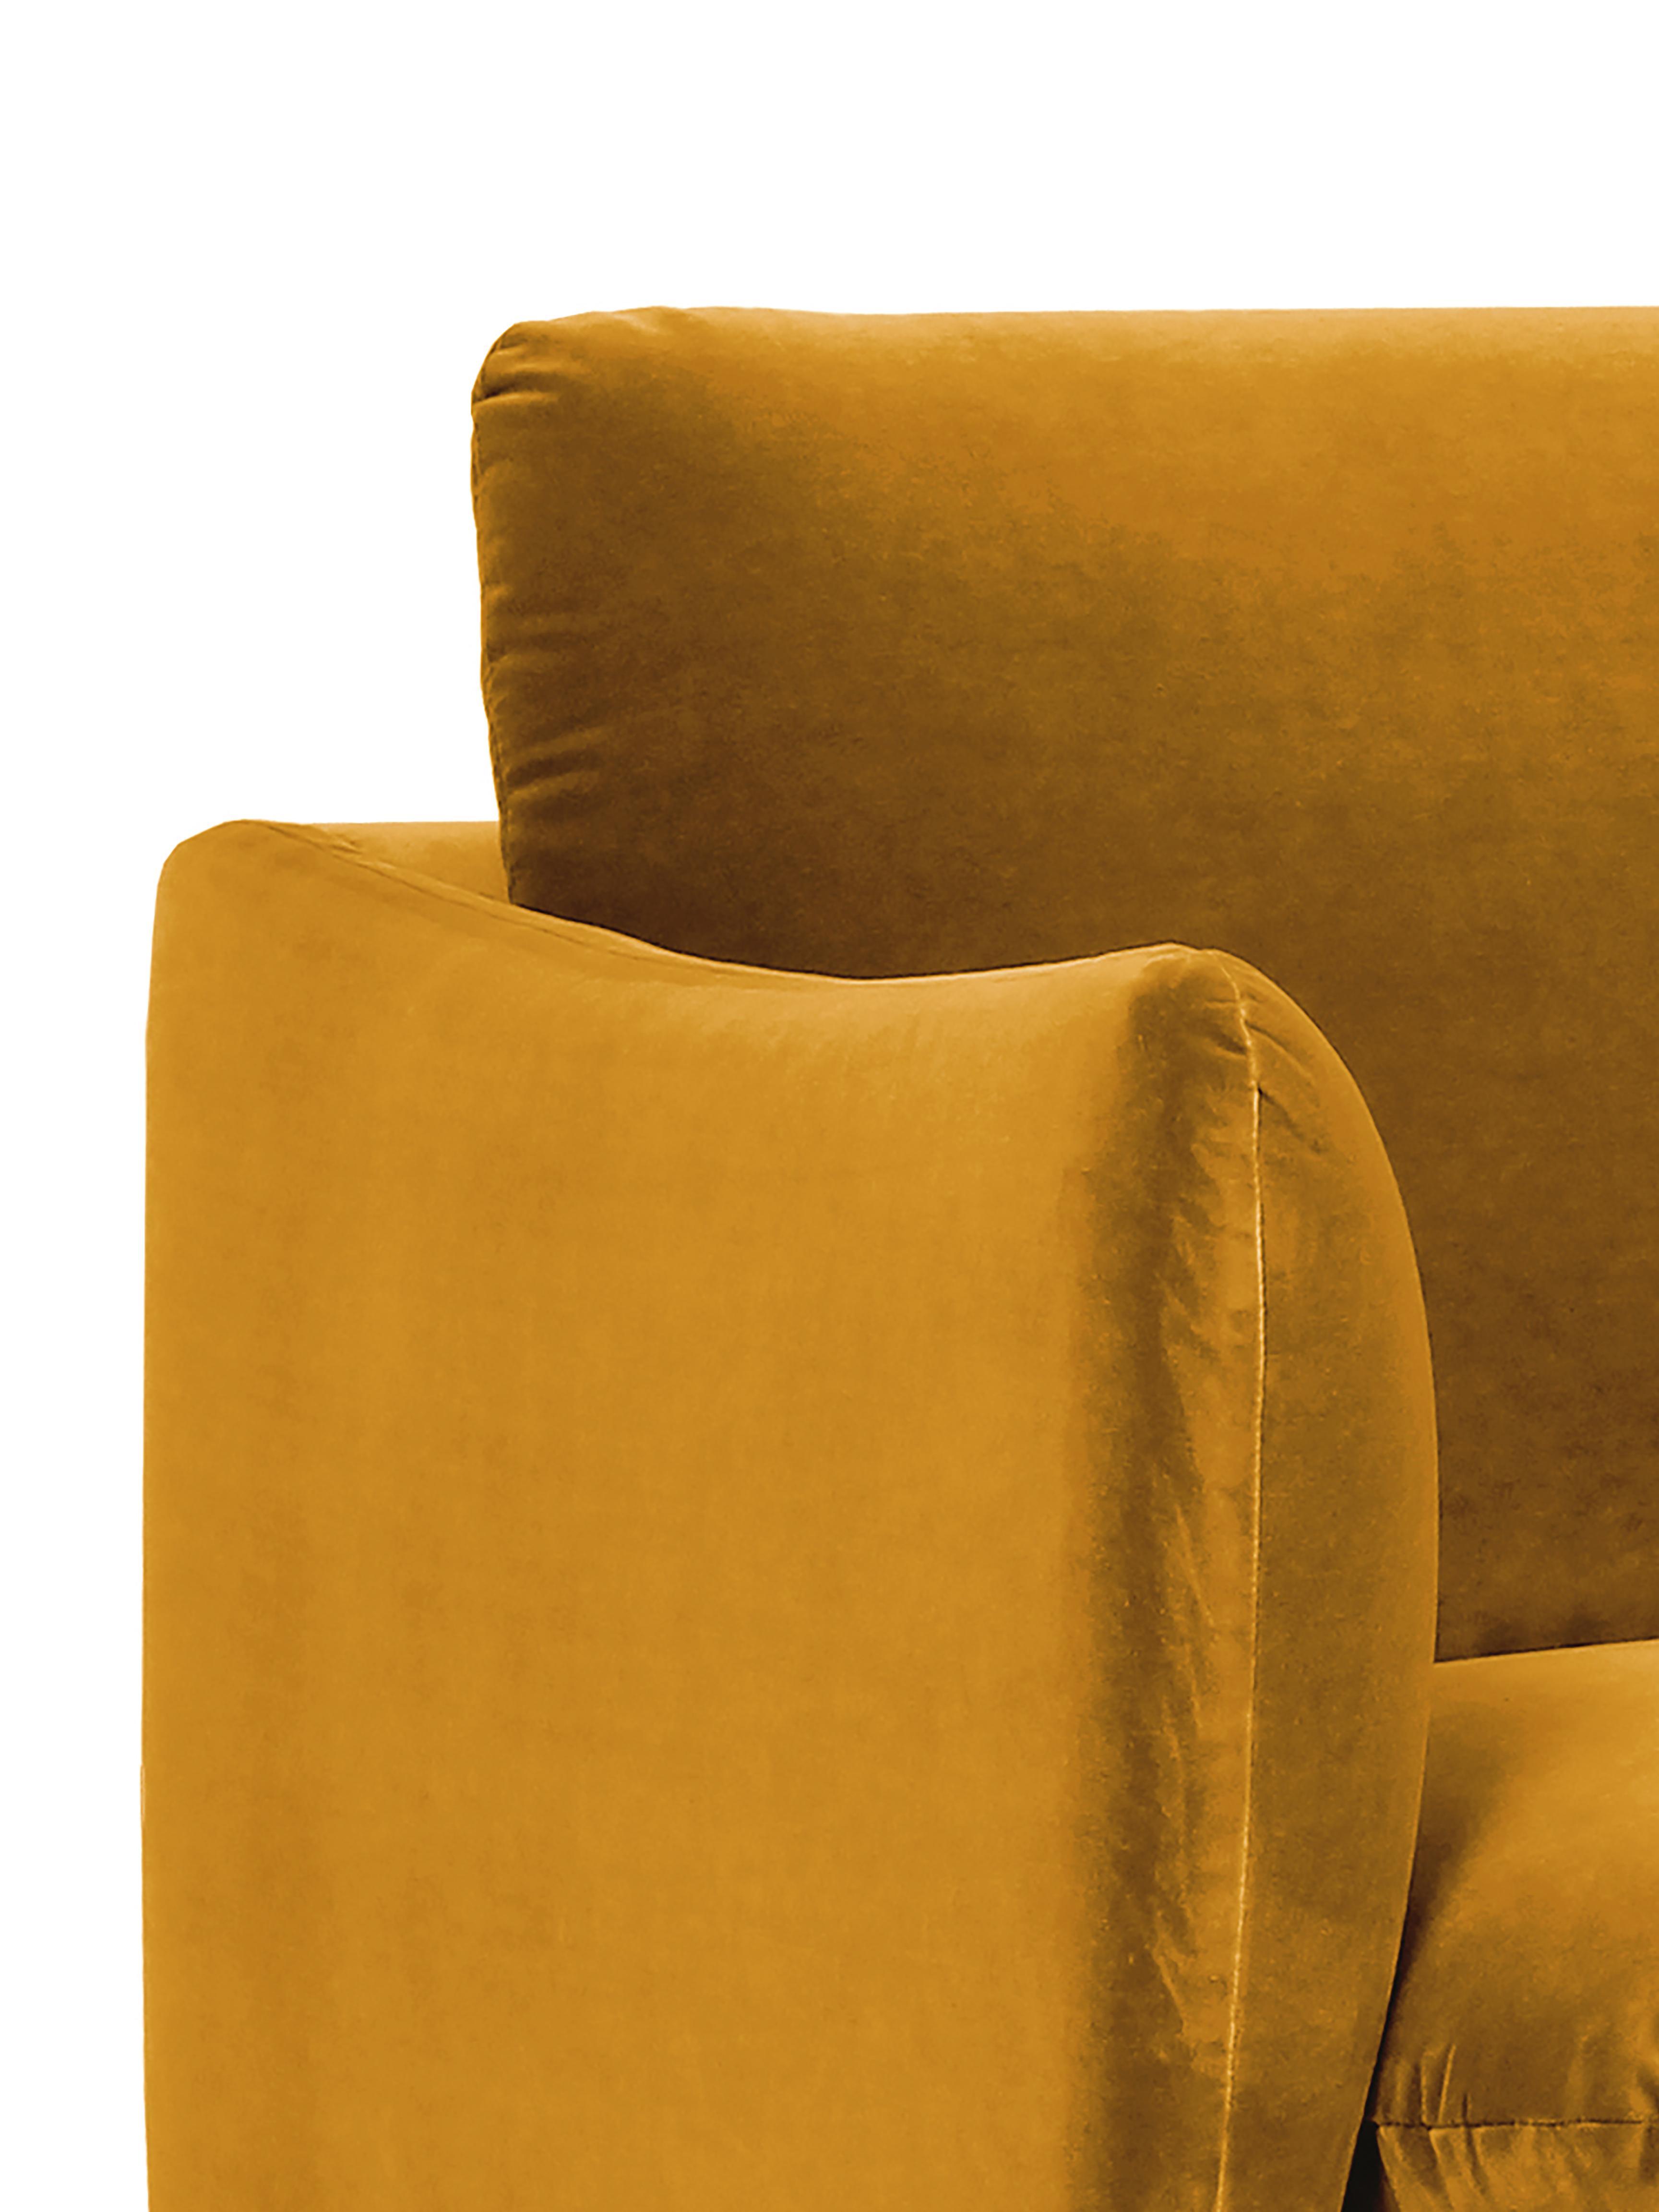 Samt-Ecksofa Moby, Bezug: Samt (Hochwertiger Polyes, Gestell: Massives Kiefernholz, Füße: Metall, pulverbeschichtet, Samt Senfgelb, B 280 x T 160 cm